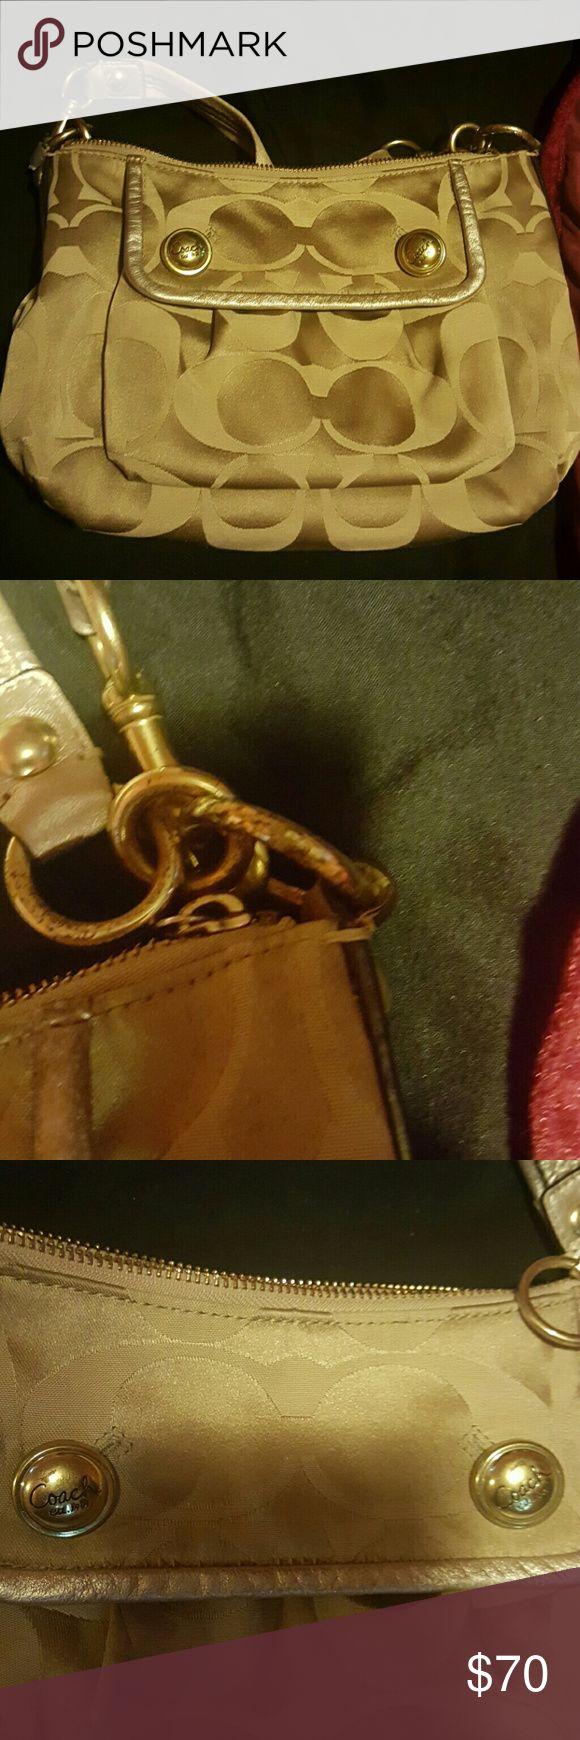 Beige coach purse Crossbody clean coach purse little wear and tear Bags Crossbody Bags